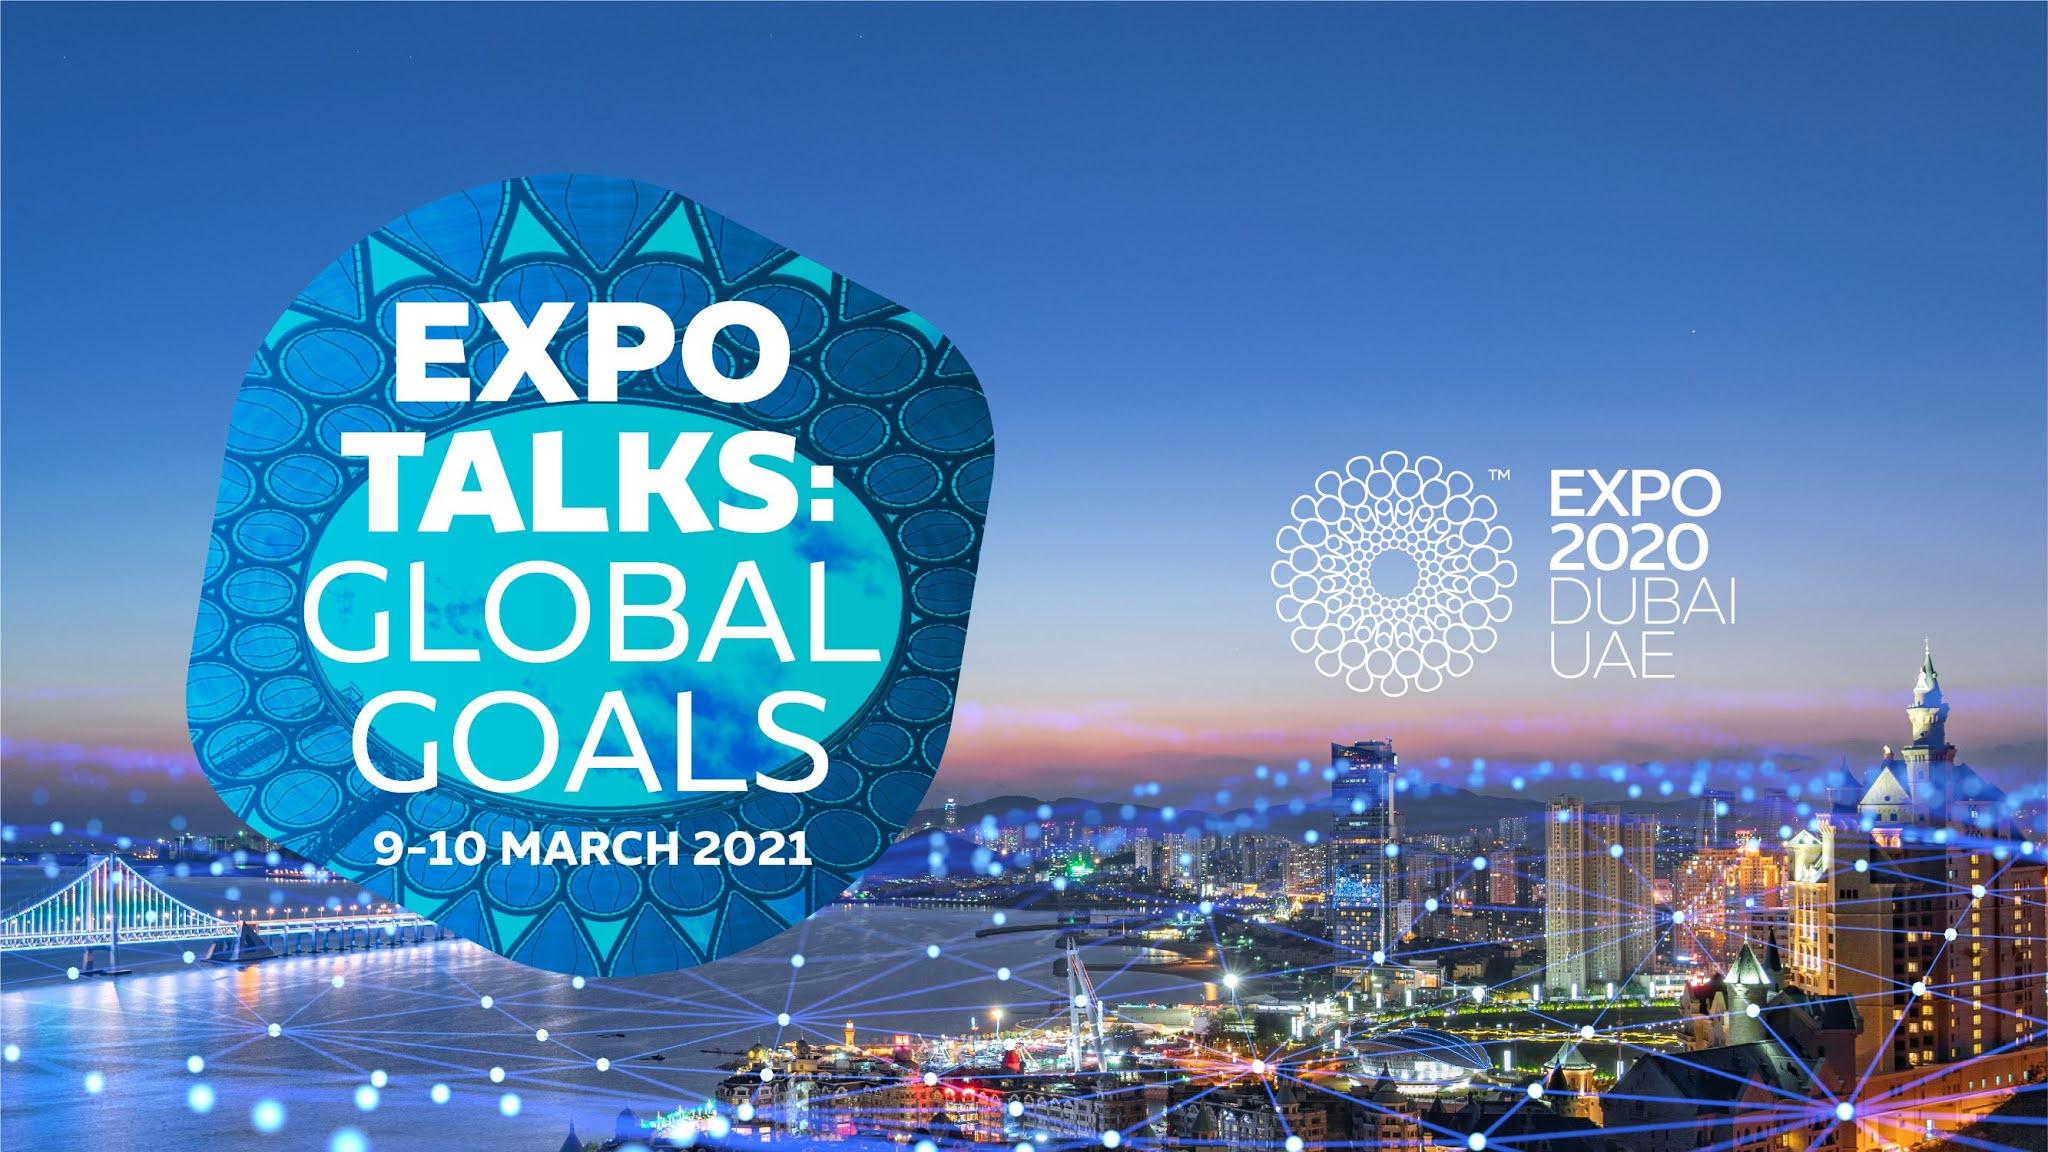 Expo virtual thematic program